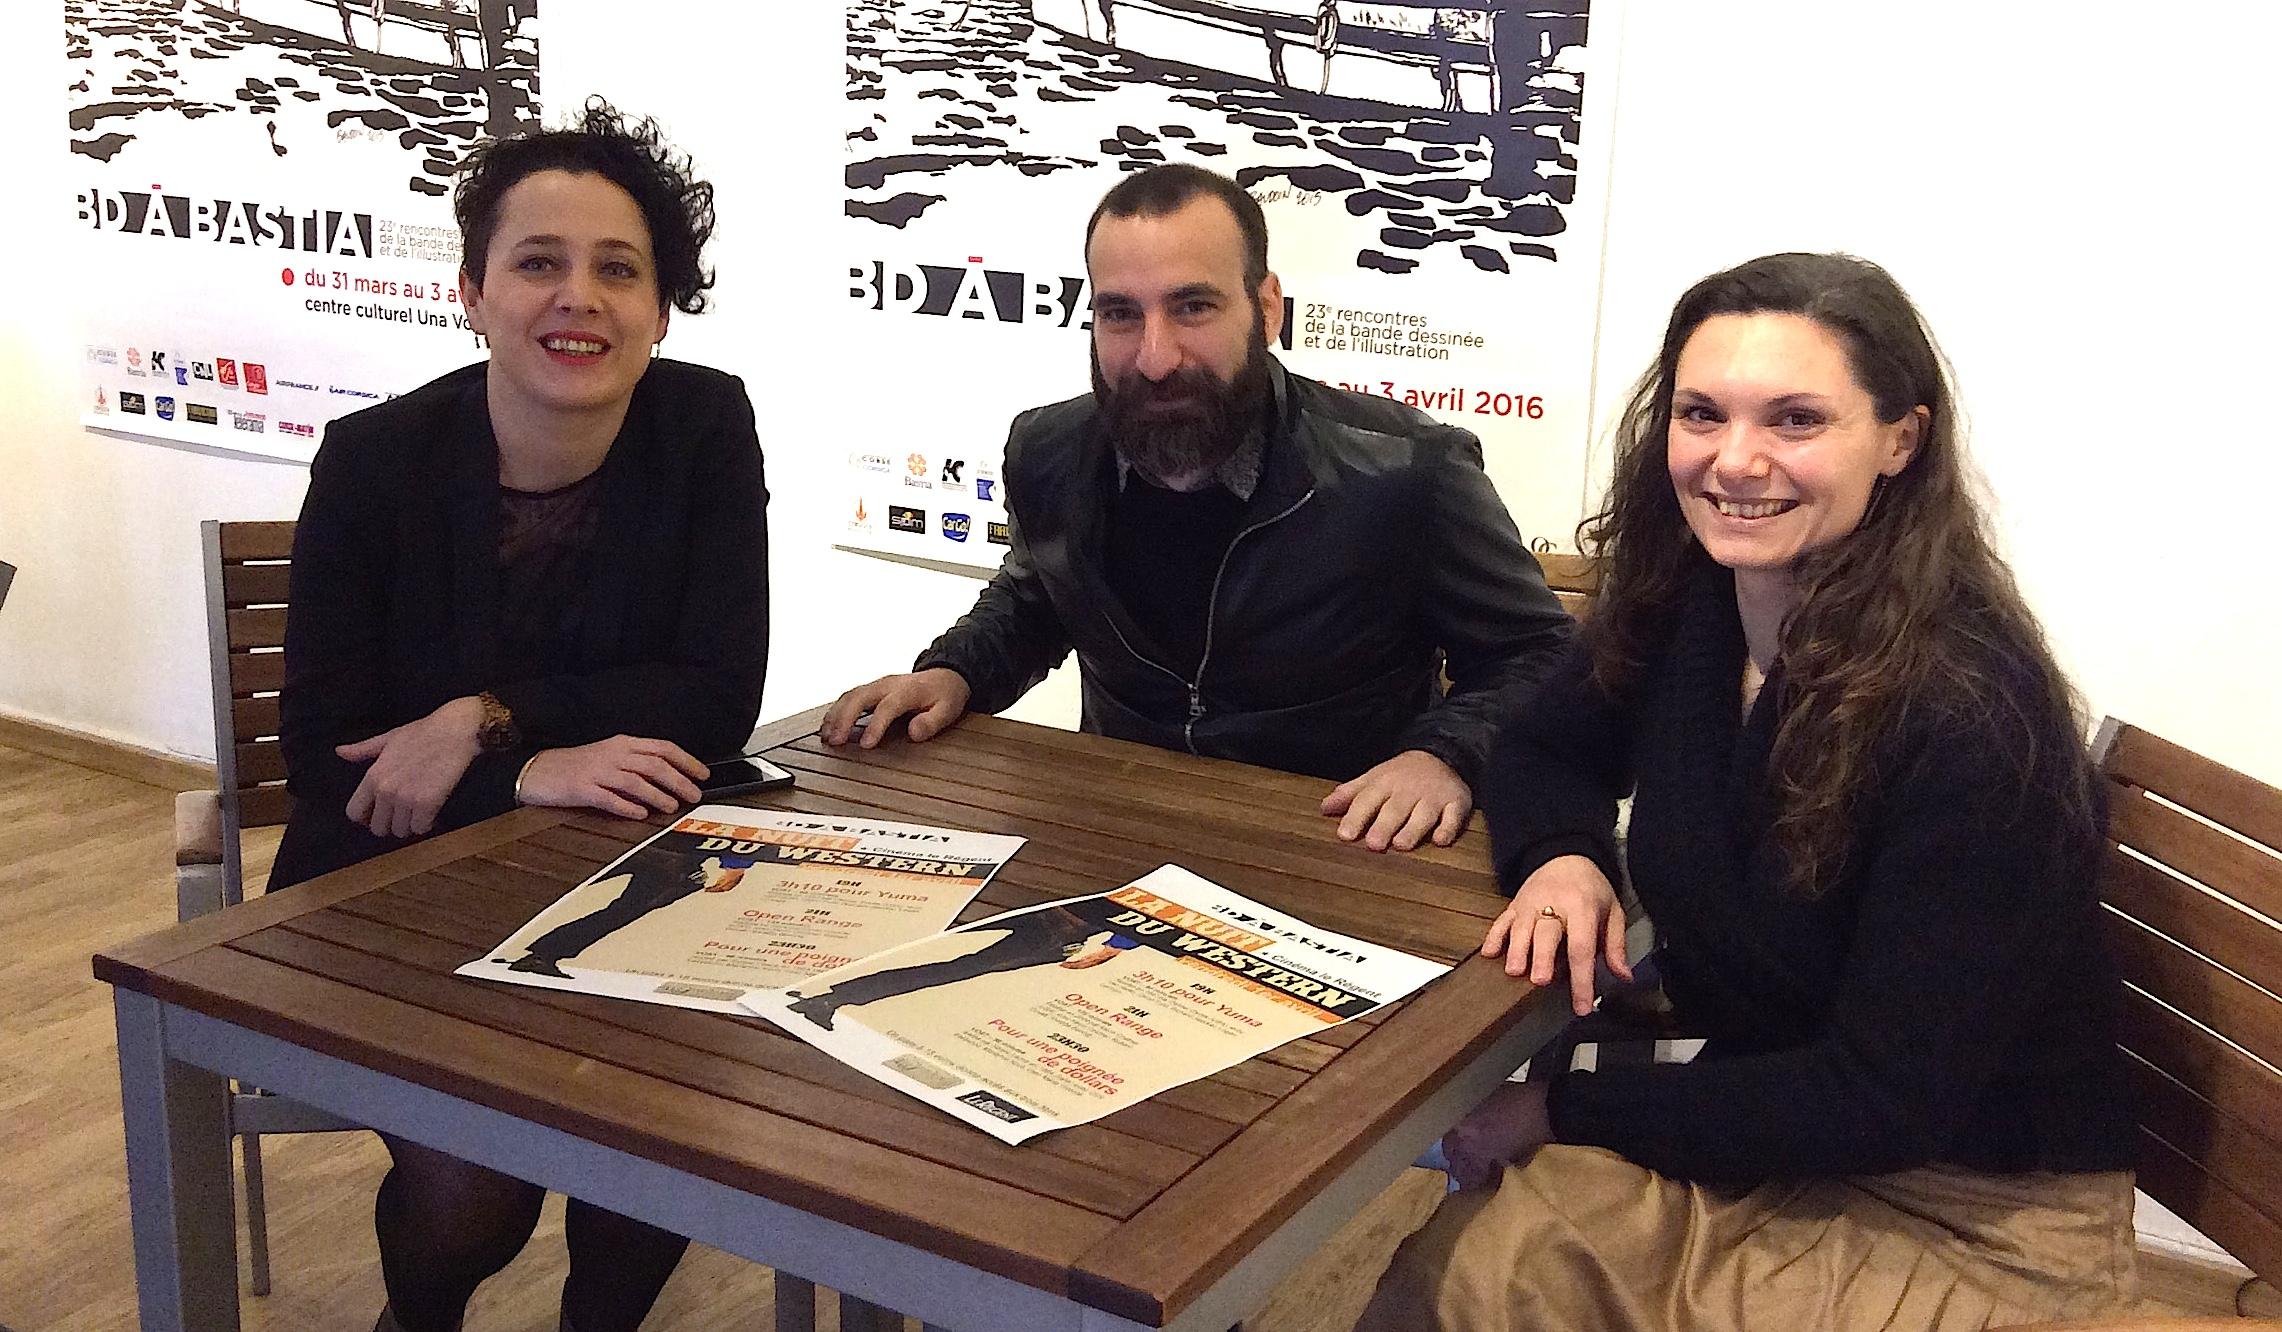 Frédérique Balbinot (The Punchline Ciné-Club Bastia), Daniel Benedittini ( cinéma Le Régent), Juana Macari (Una Volta)